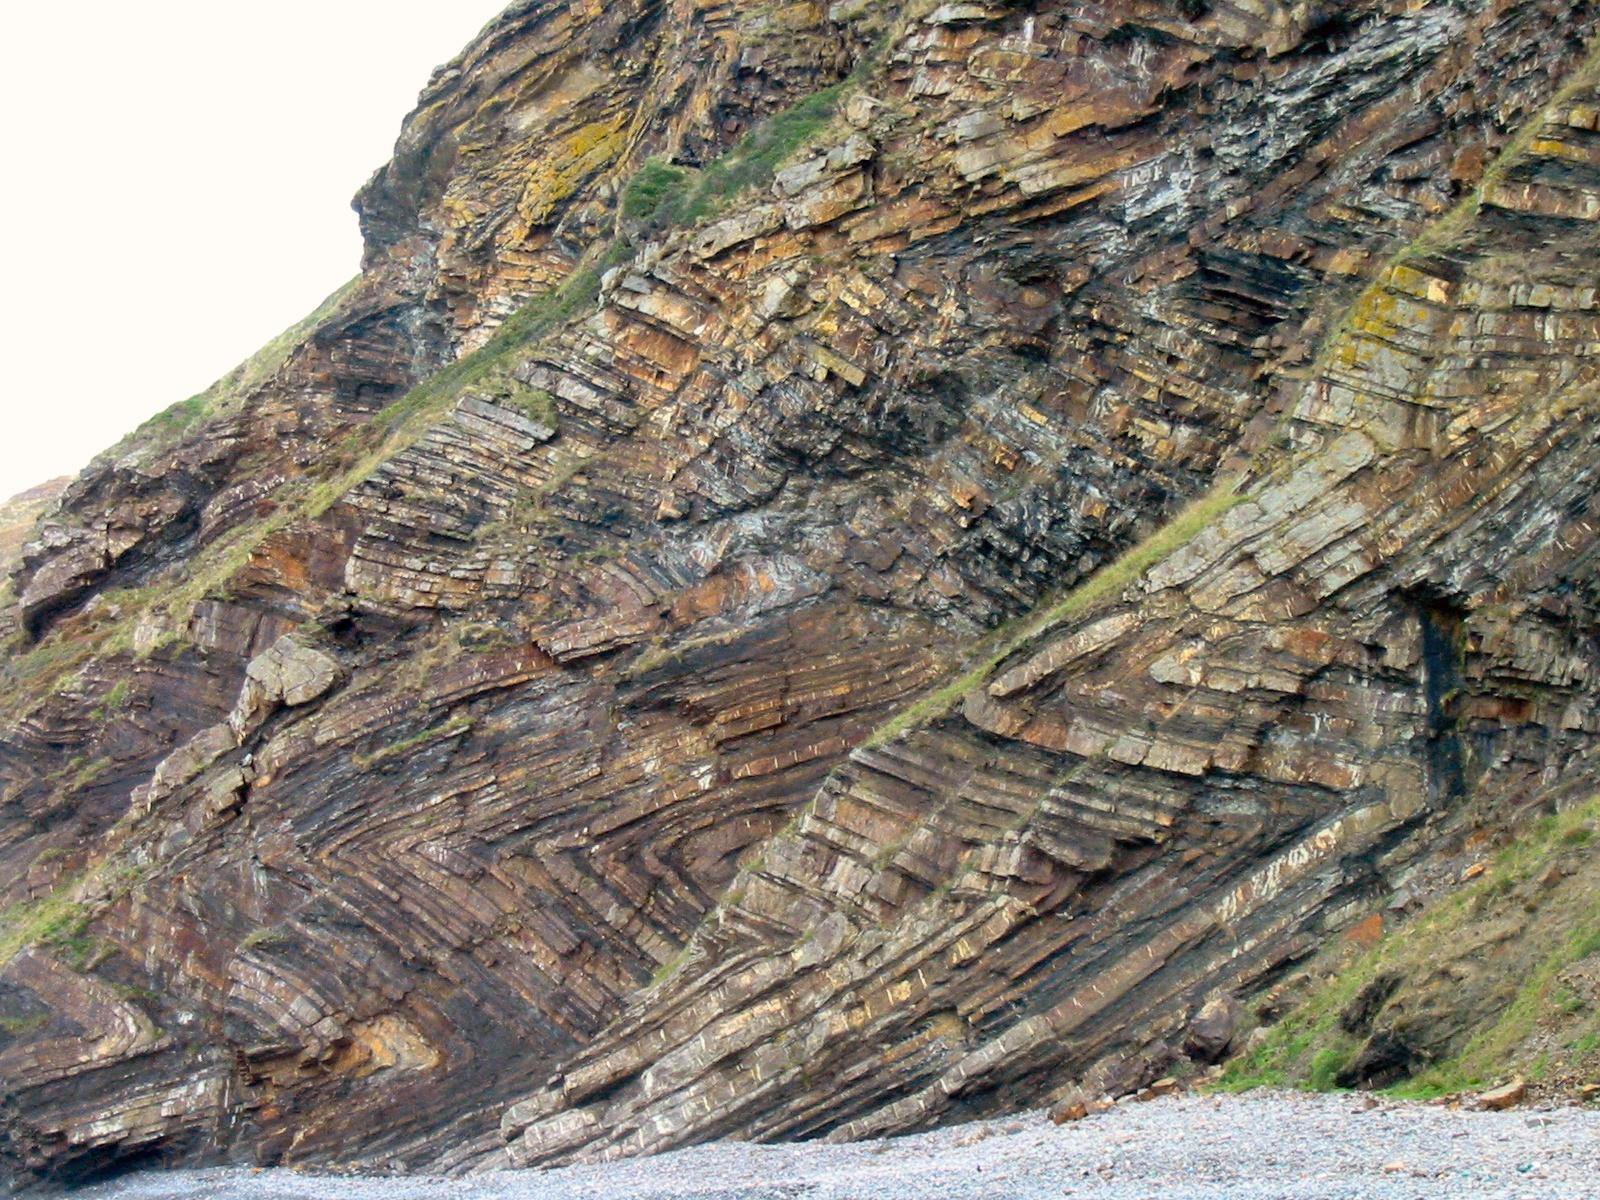 Chevron (geology)